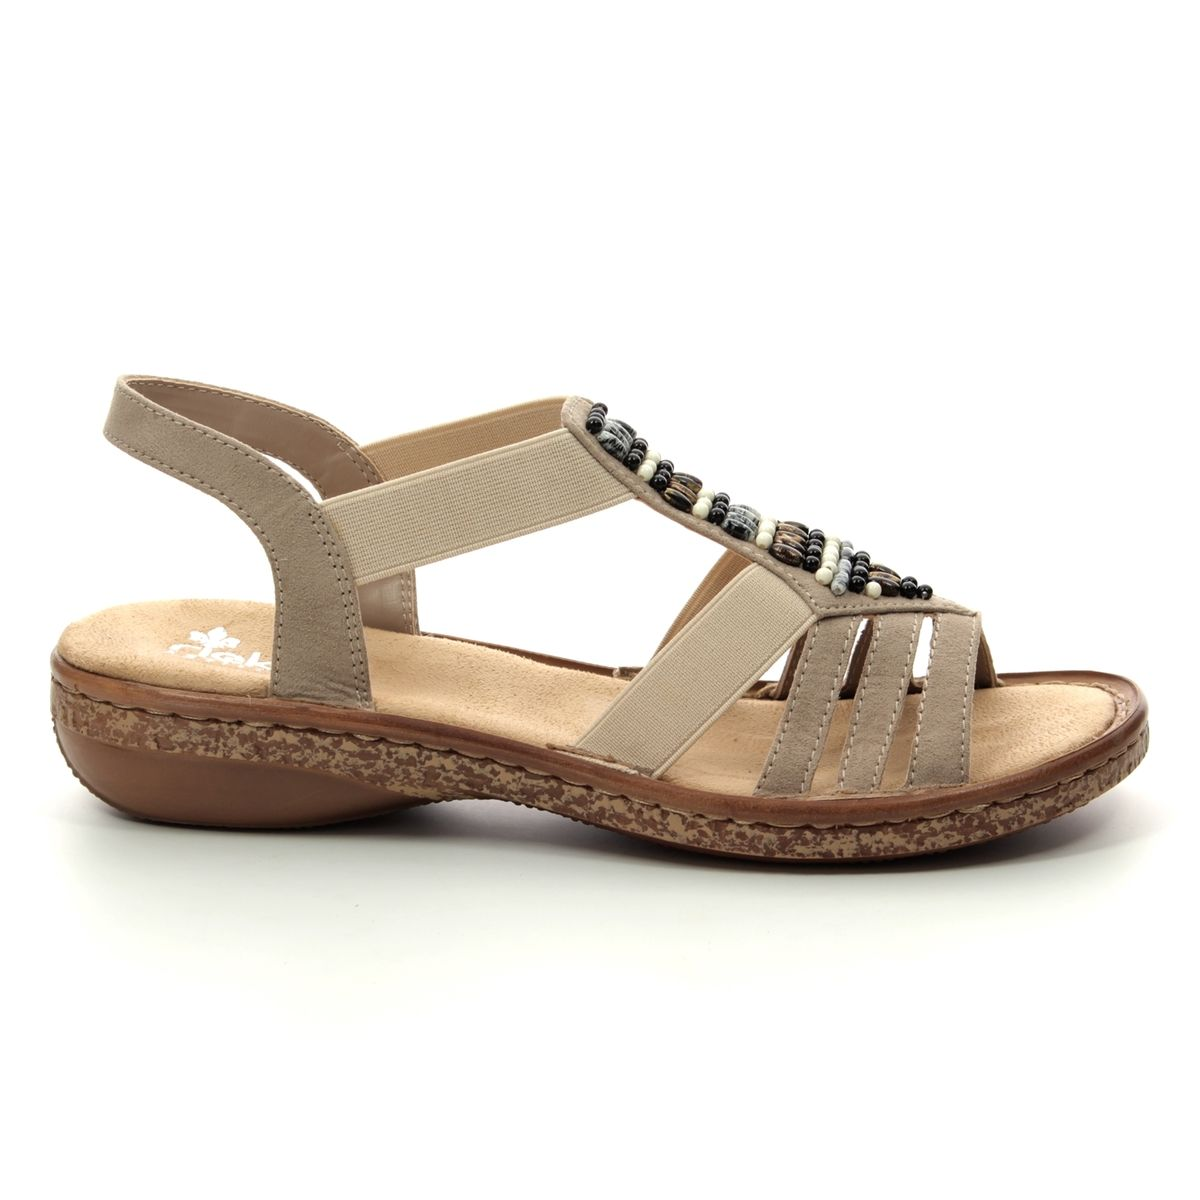 1829e20e467c Rieker Sandals - Beige - 62851-60 REGIBEADS